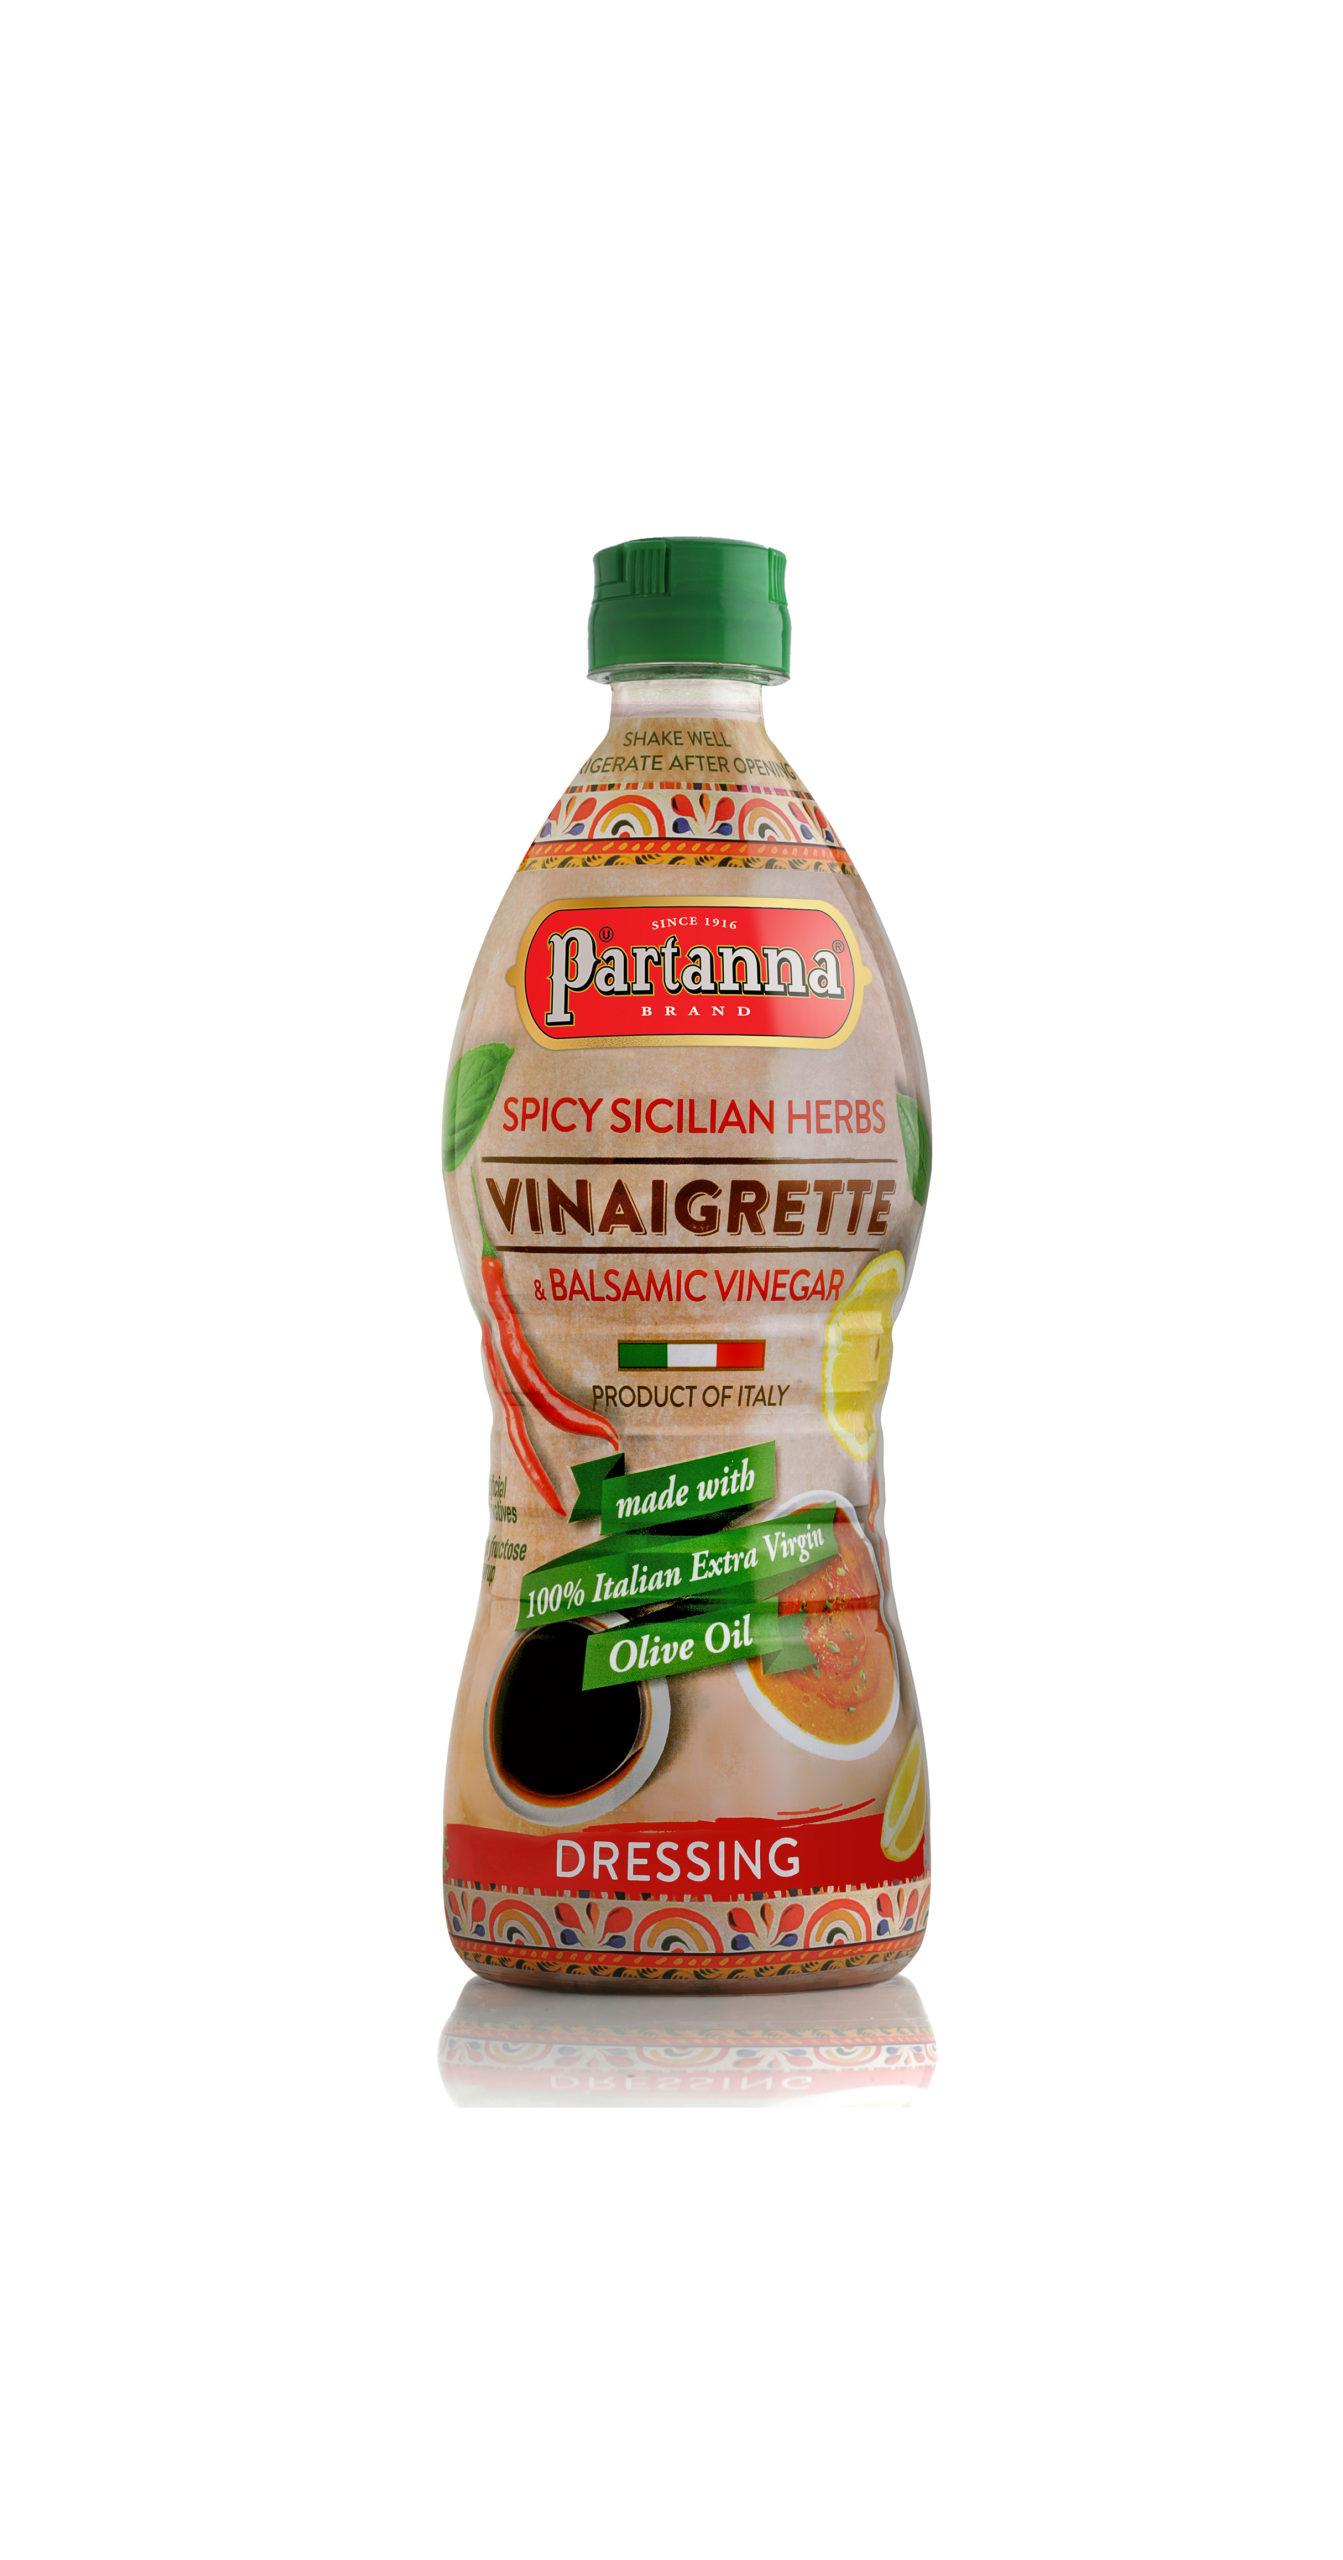 Partanna Spicy Sicilian Herbs Vinaigrette